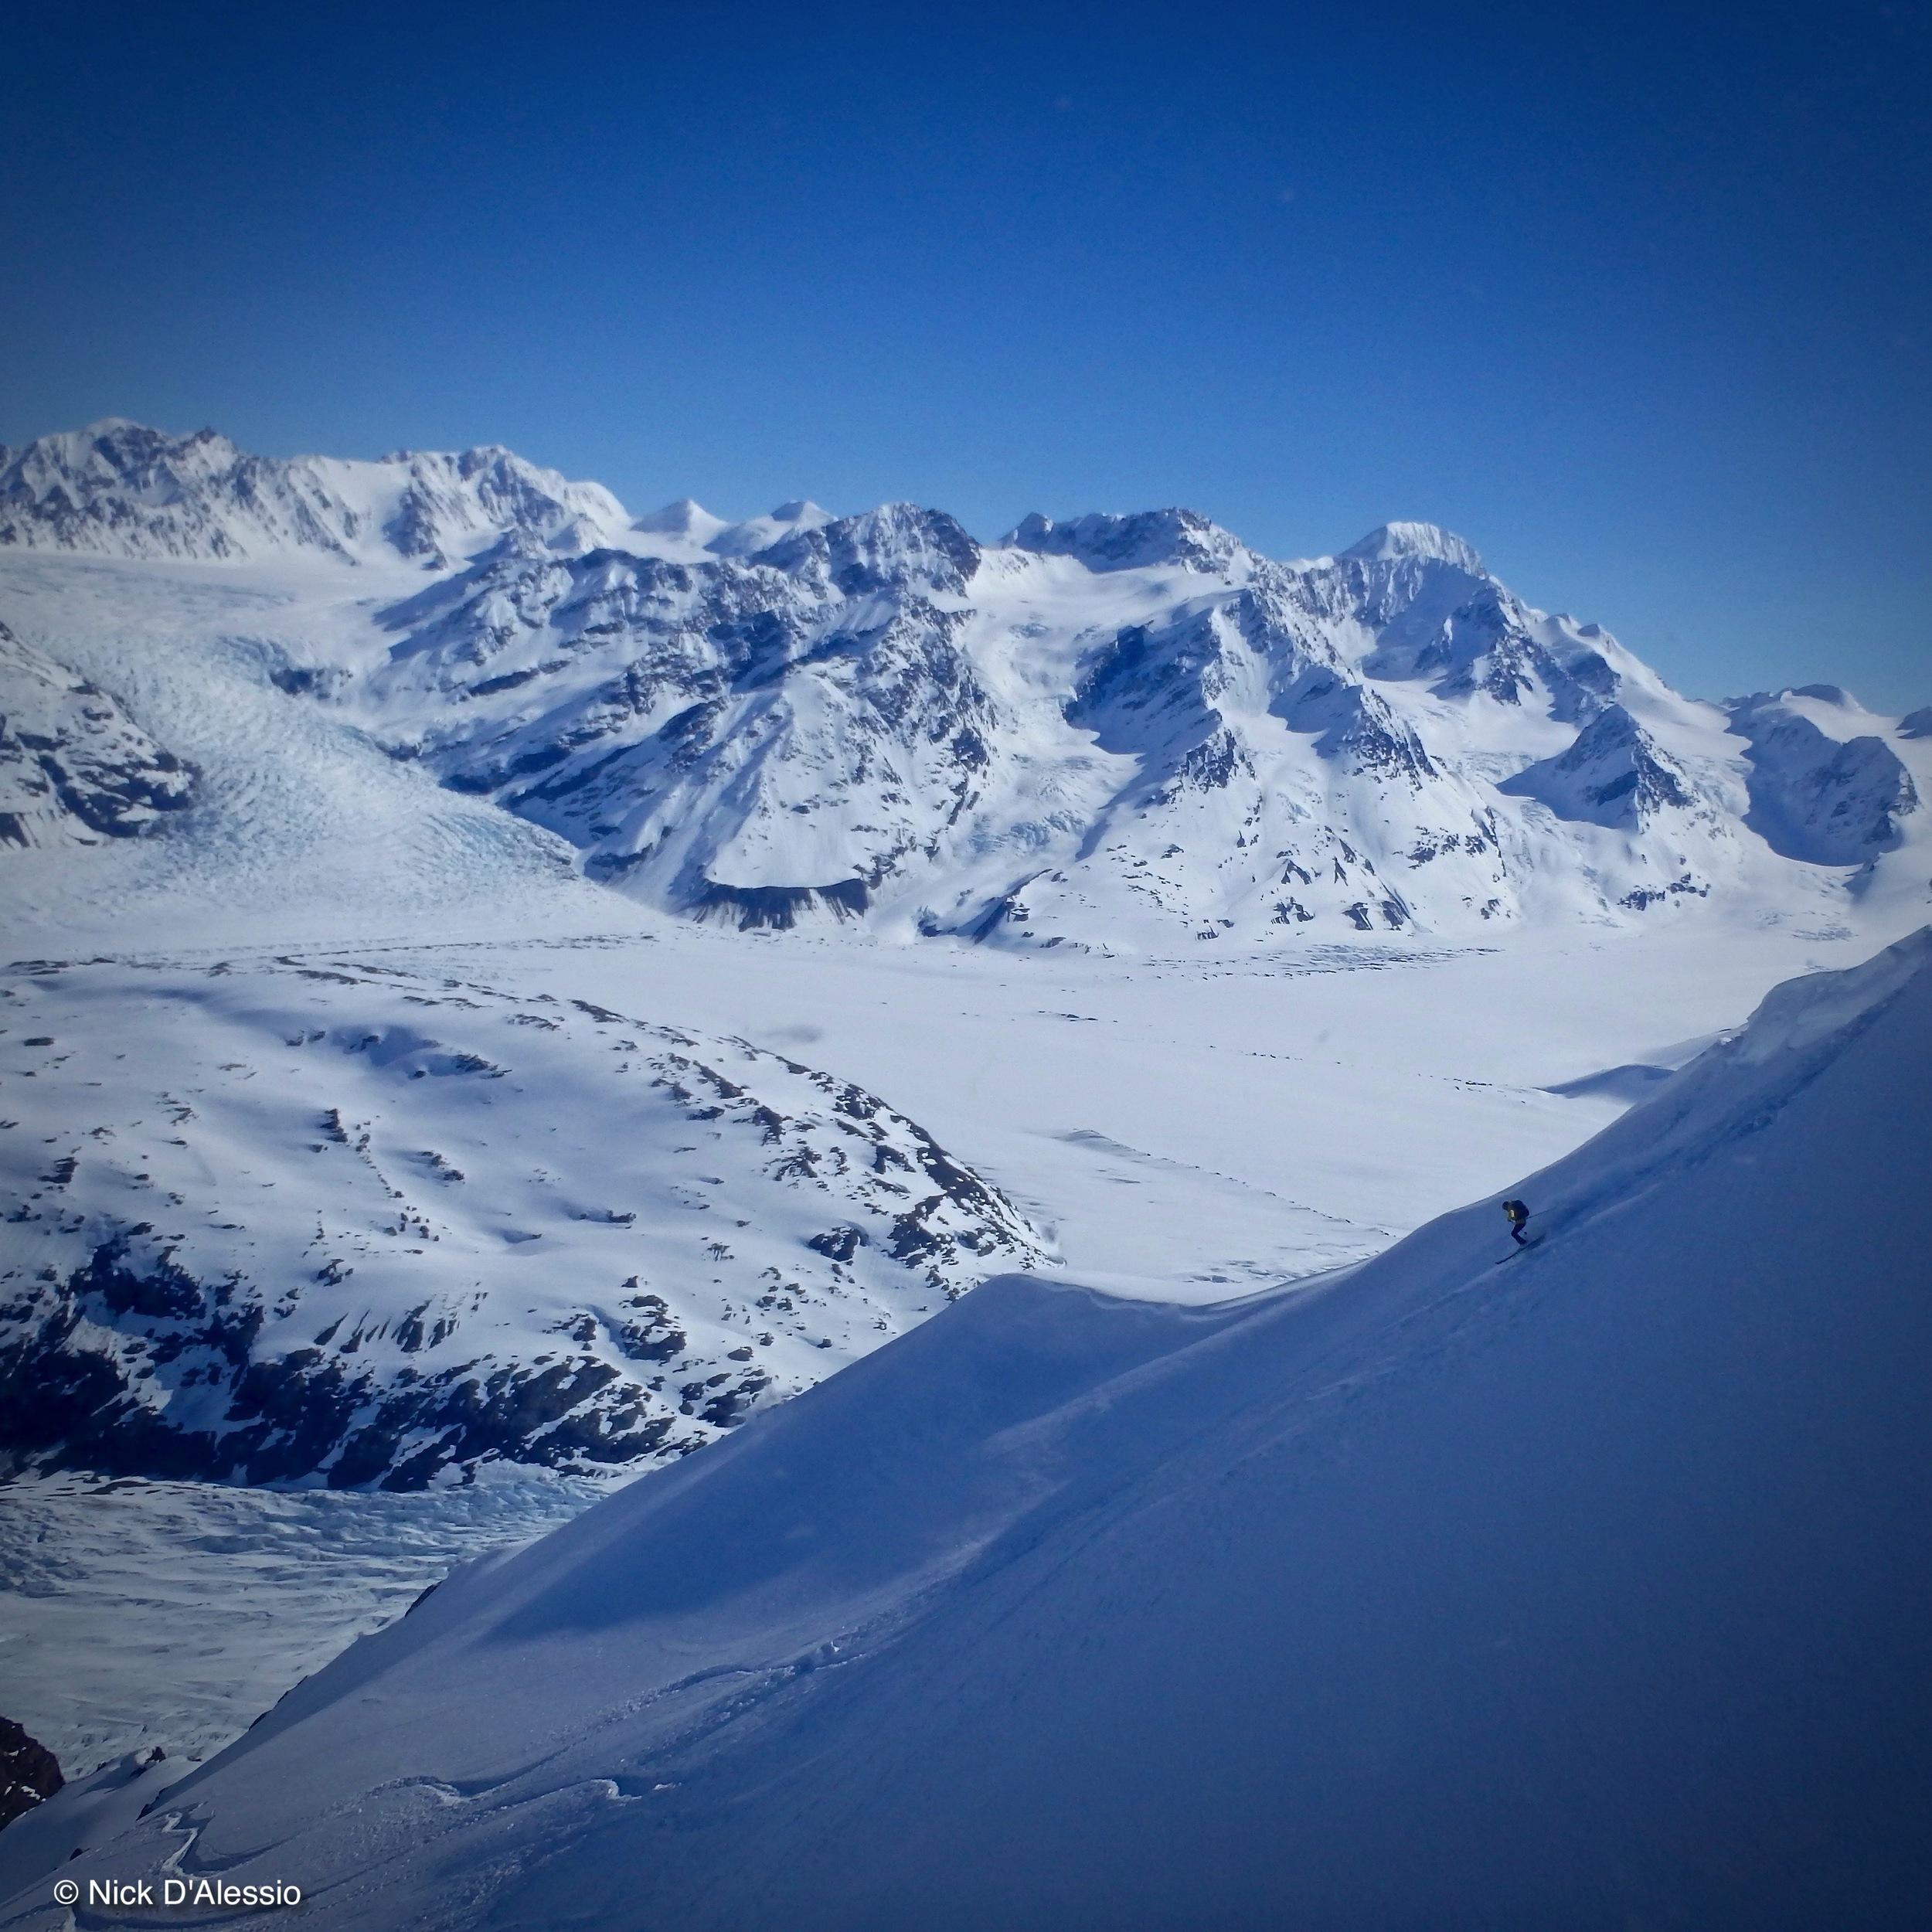 Skiing in Alaska, Chugach Mountains